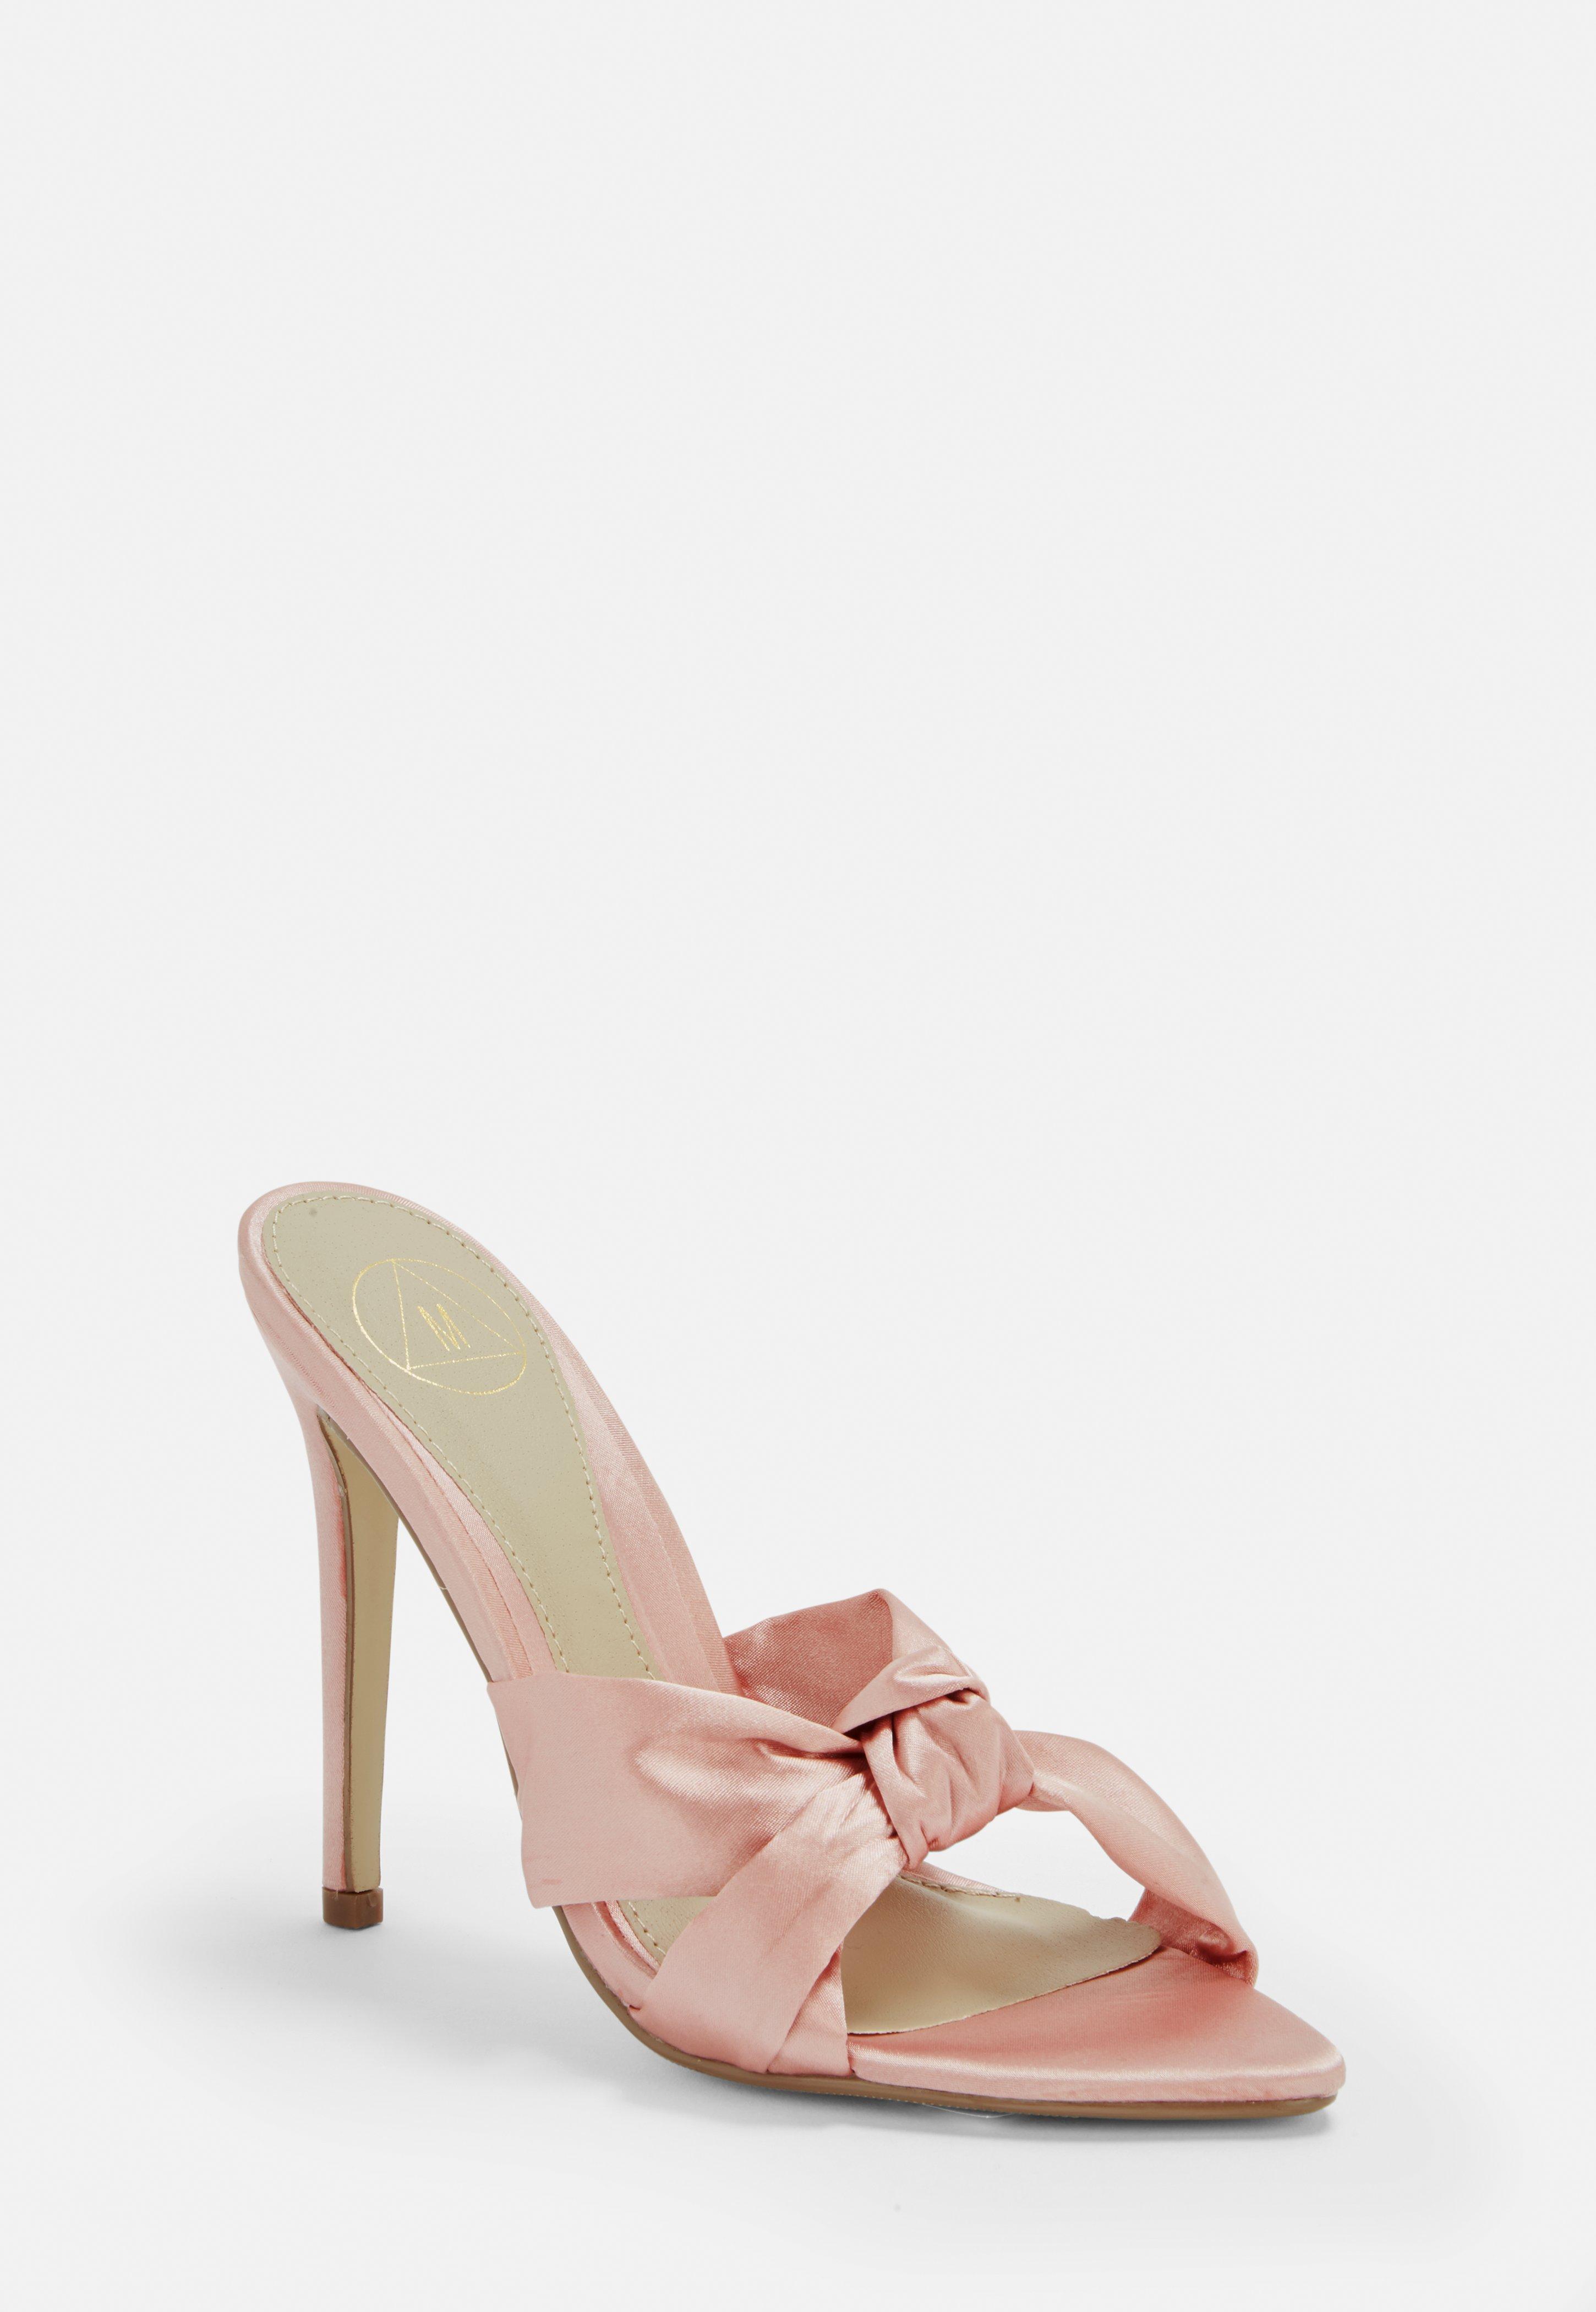 4e089703495 Pink Heels